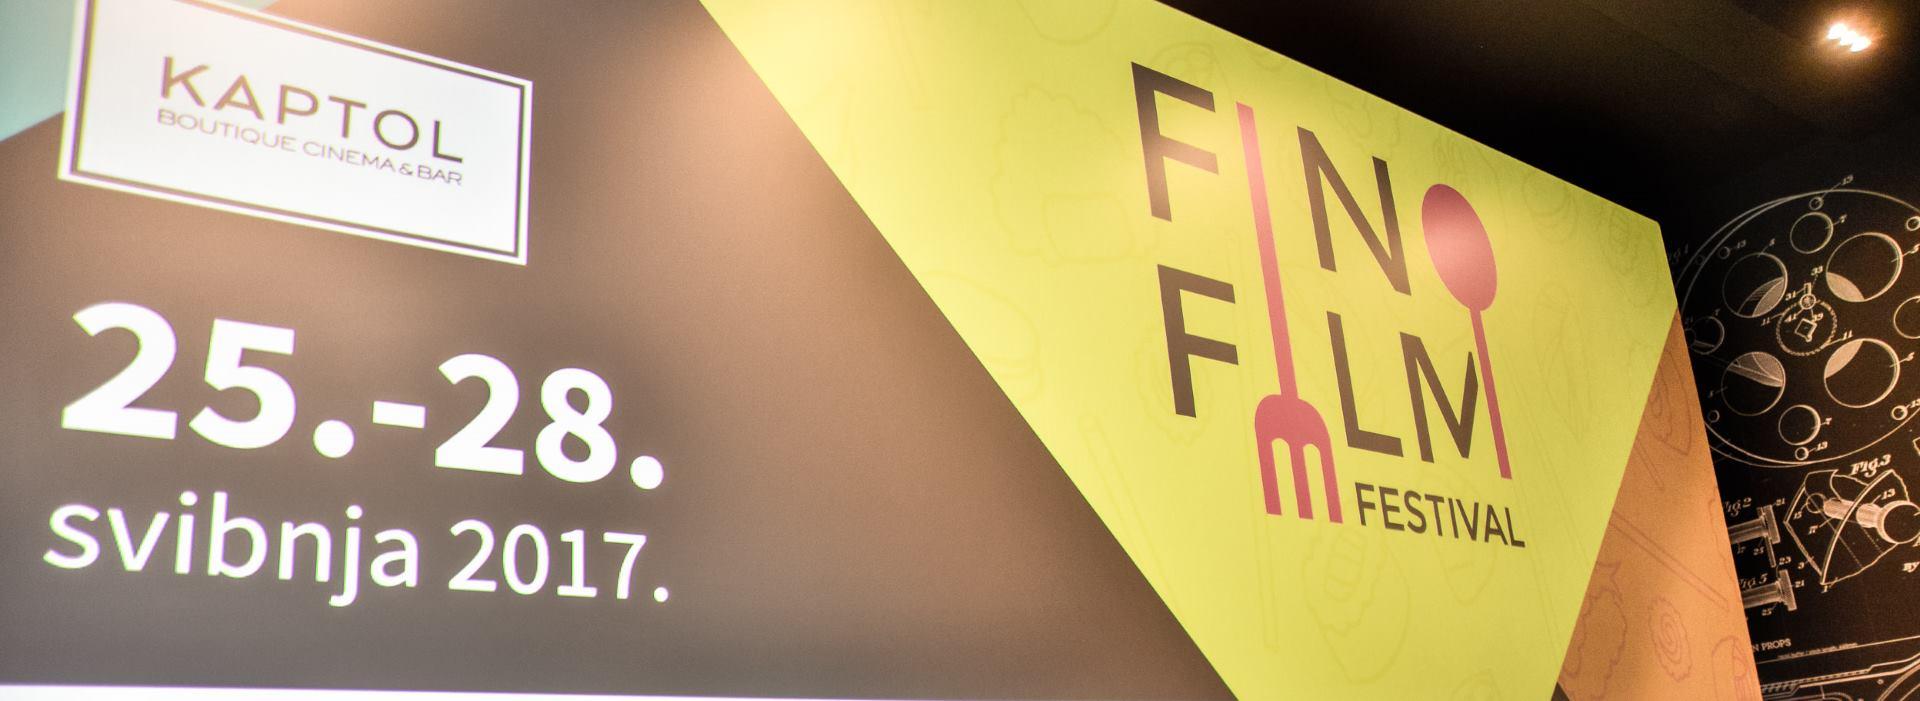 FOTO: Održano svečano otvorenje FINO FILM FESTIVALA